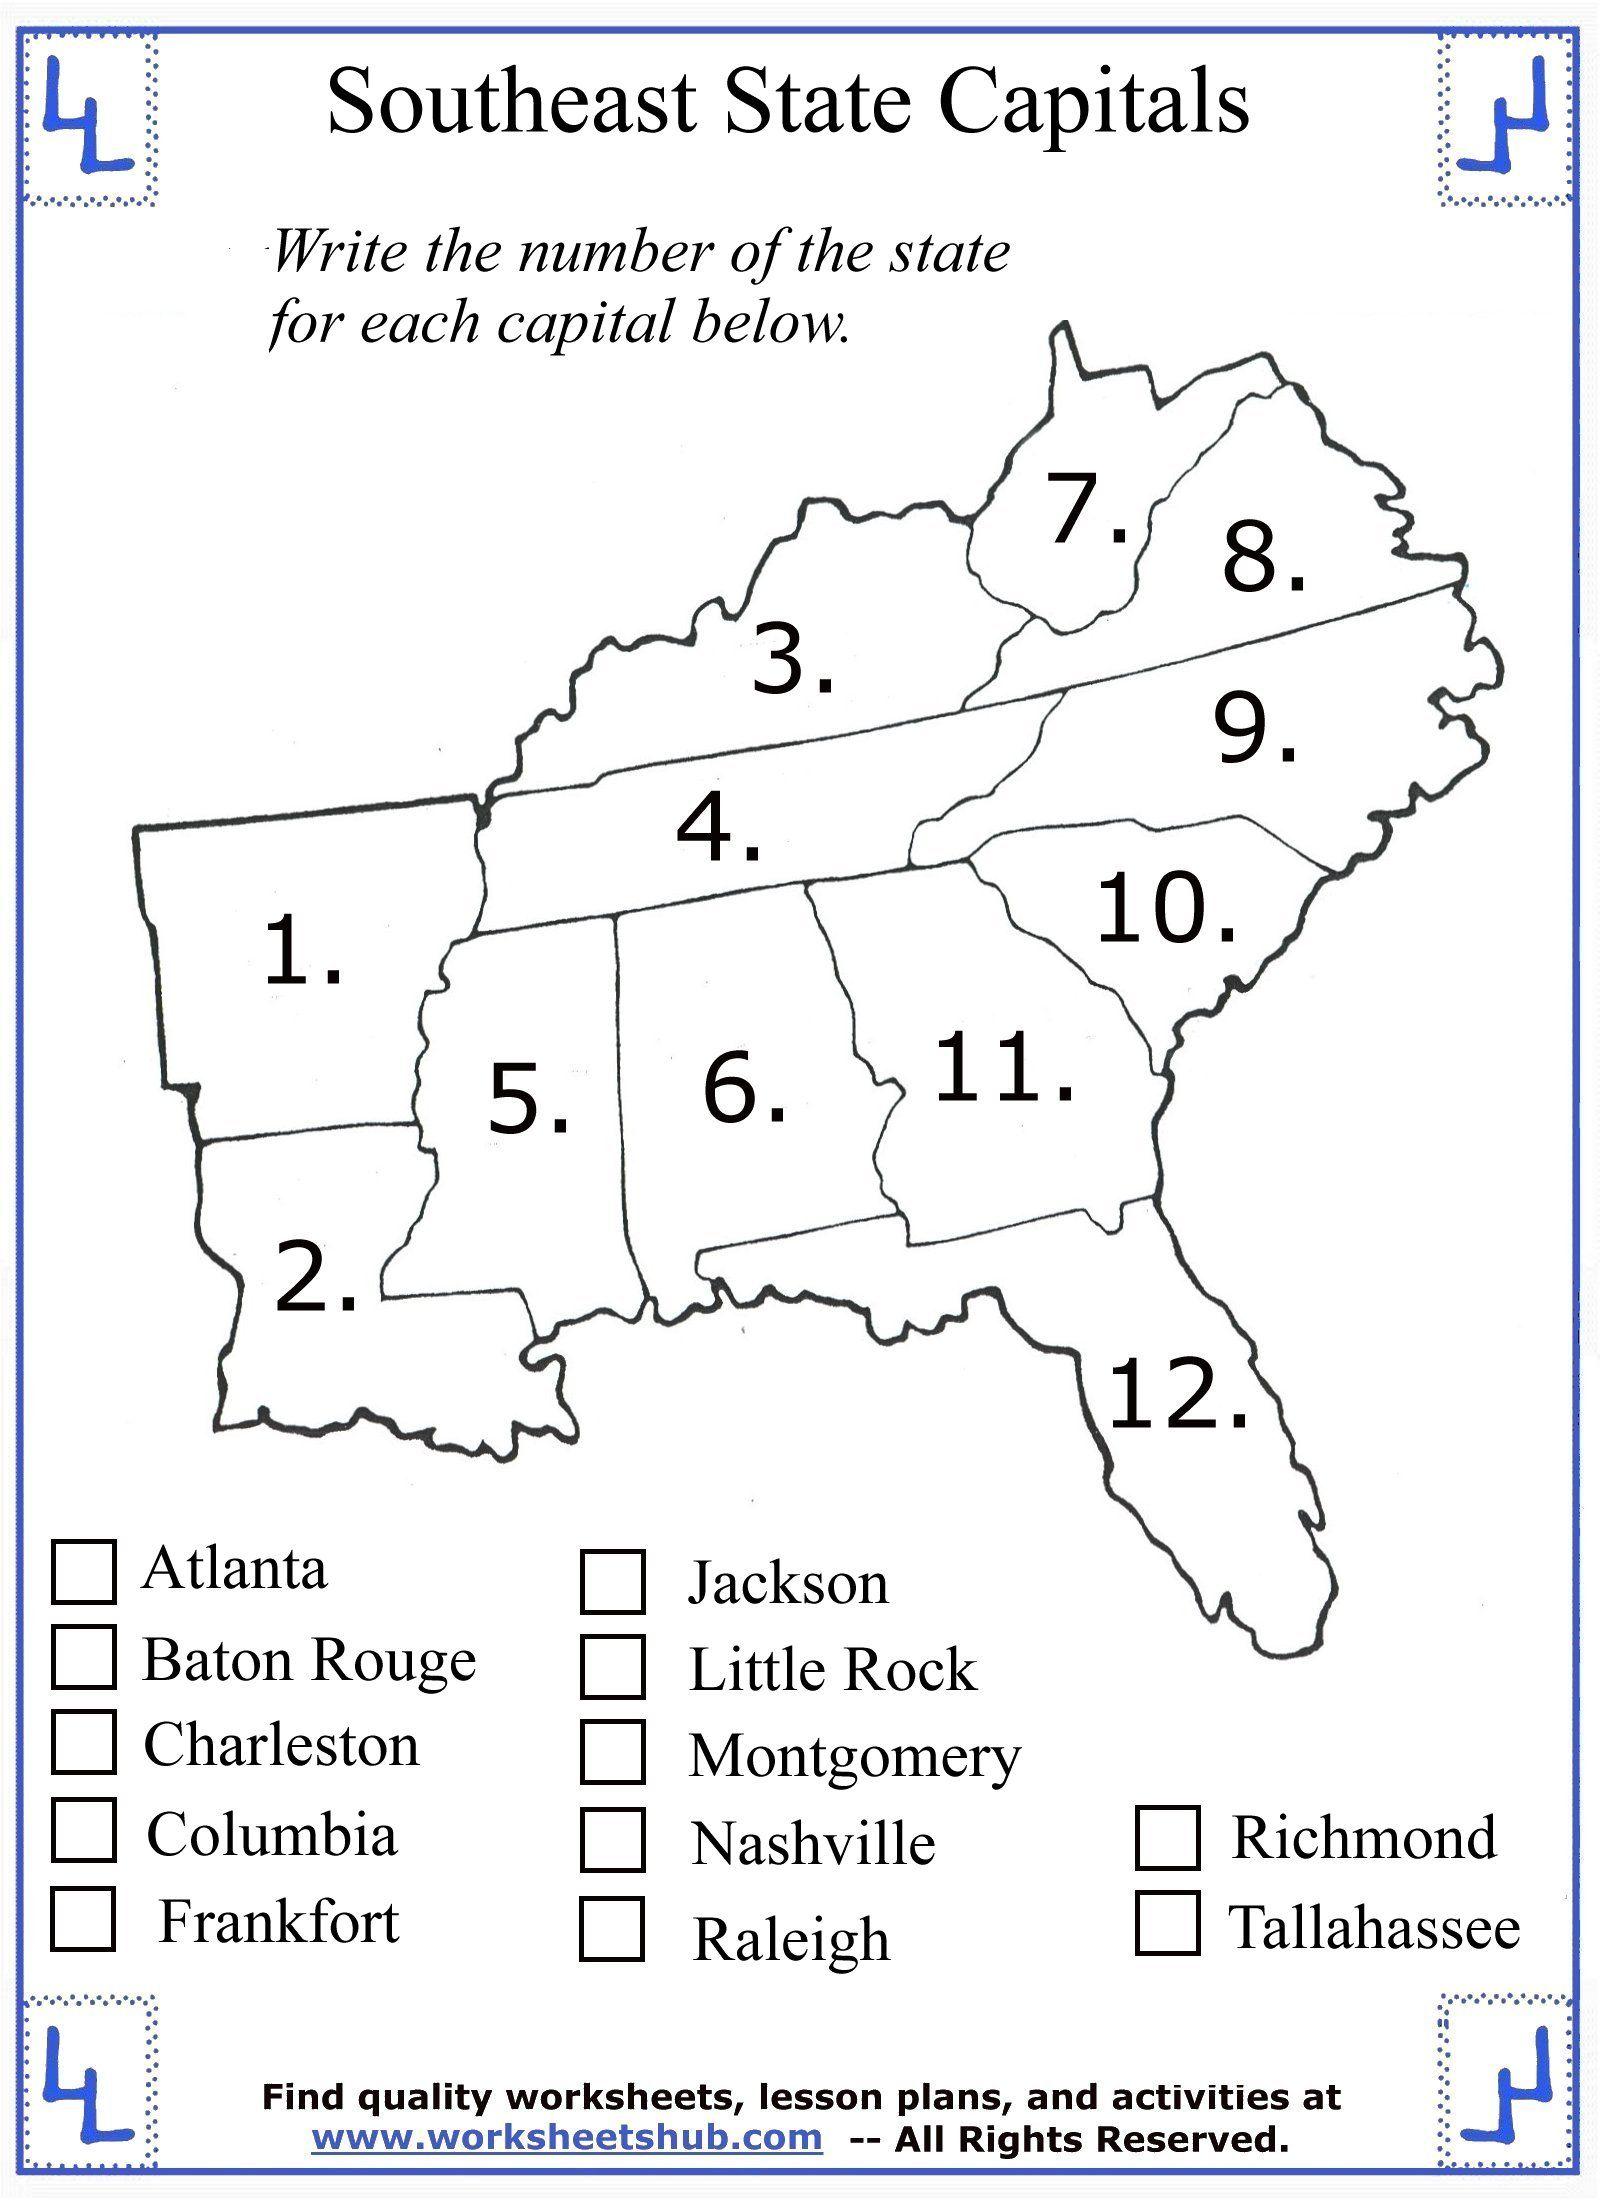 4th Grade Social Stu S Southeast State Capitals 01